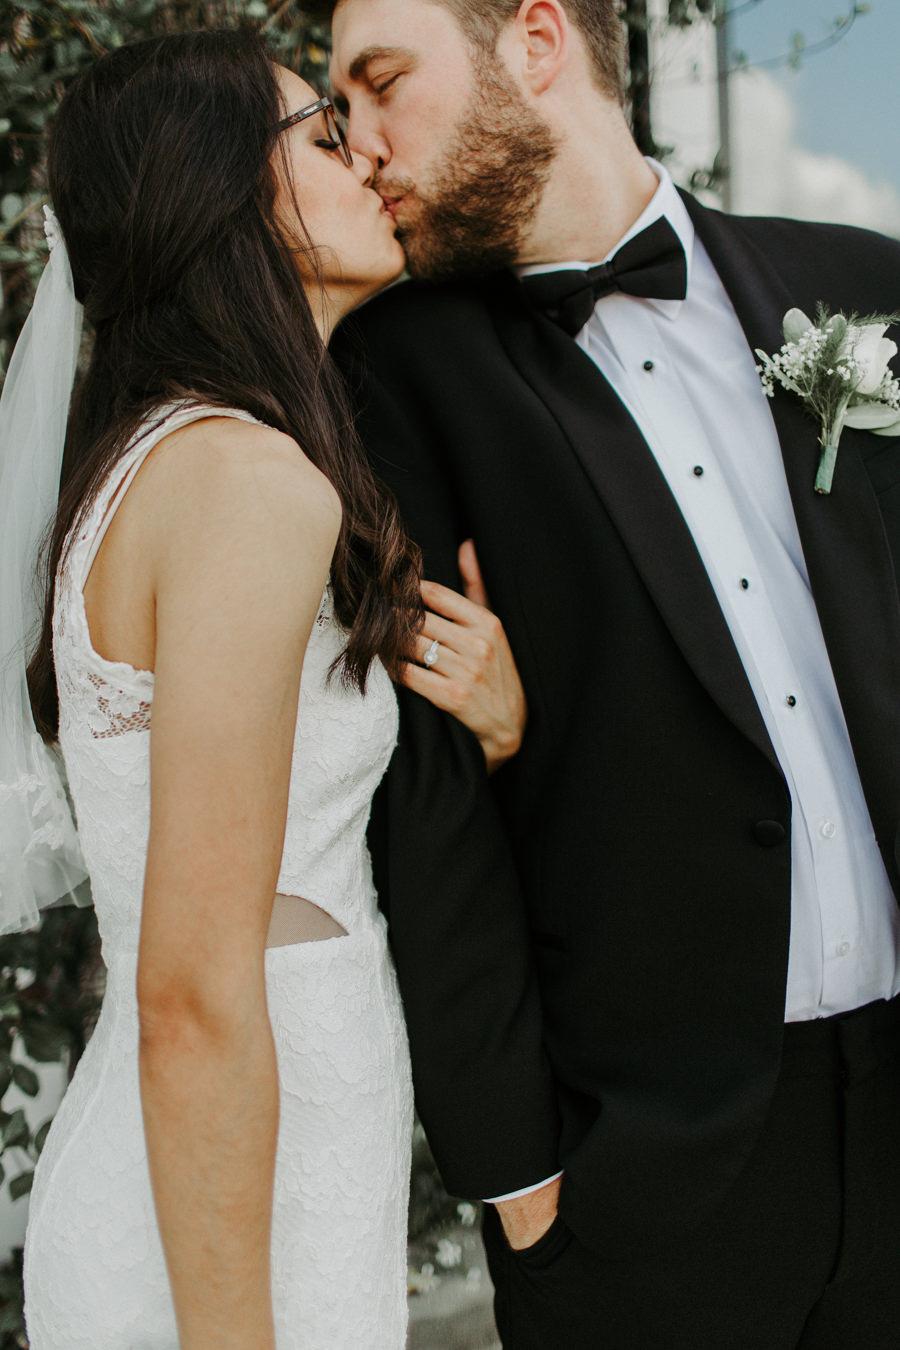 Tampa Heights Industrial Wedding at Cavu Emmy RJ-119.jpg